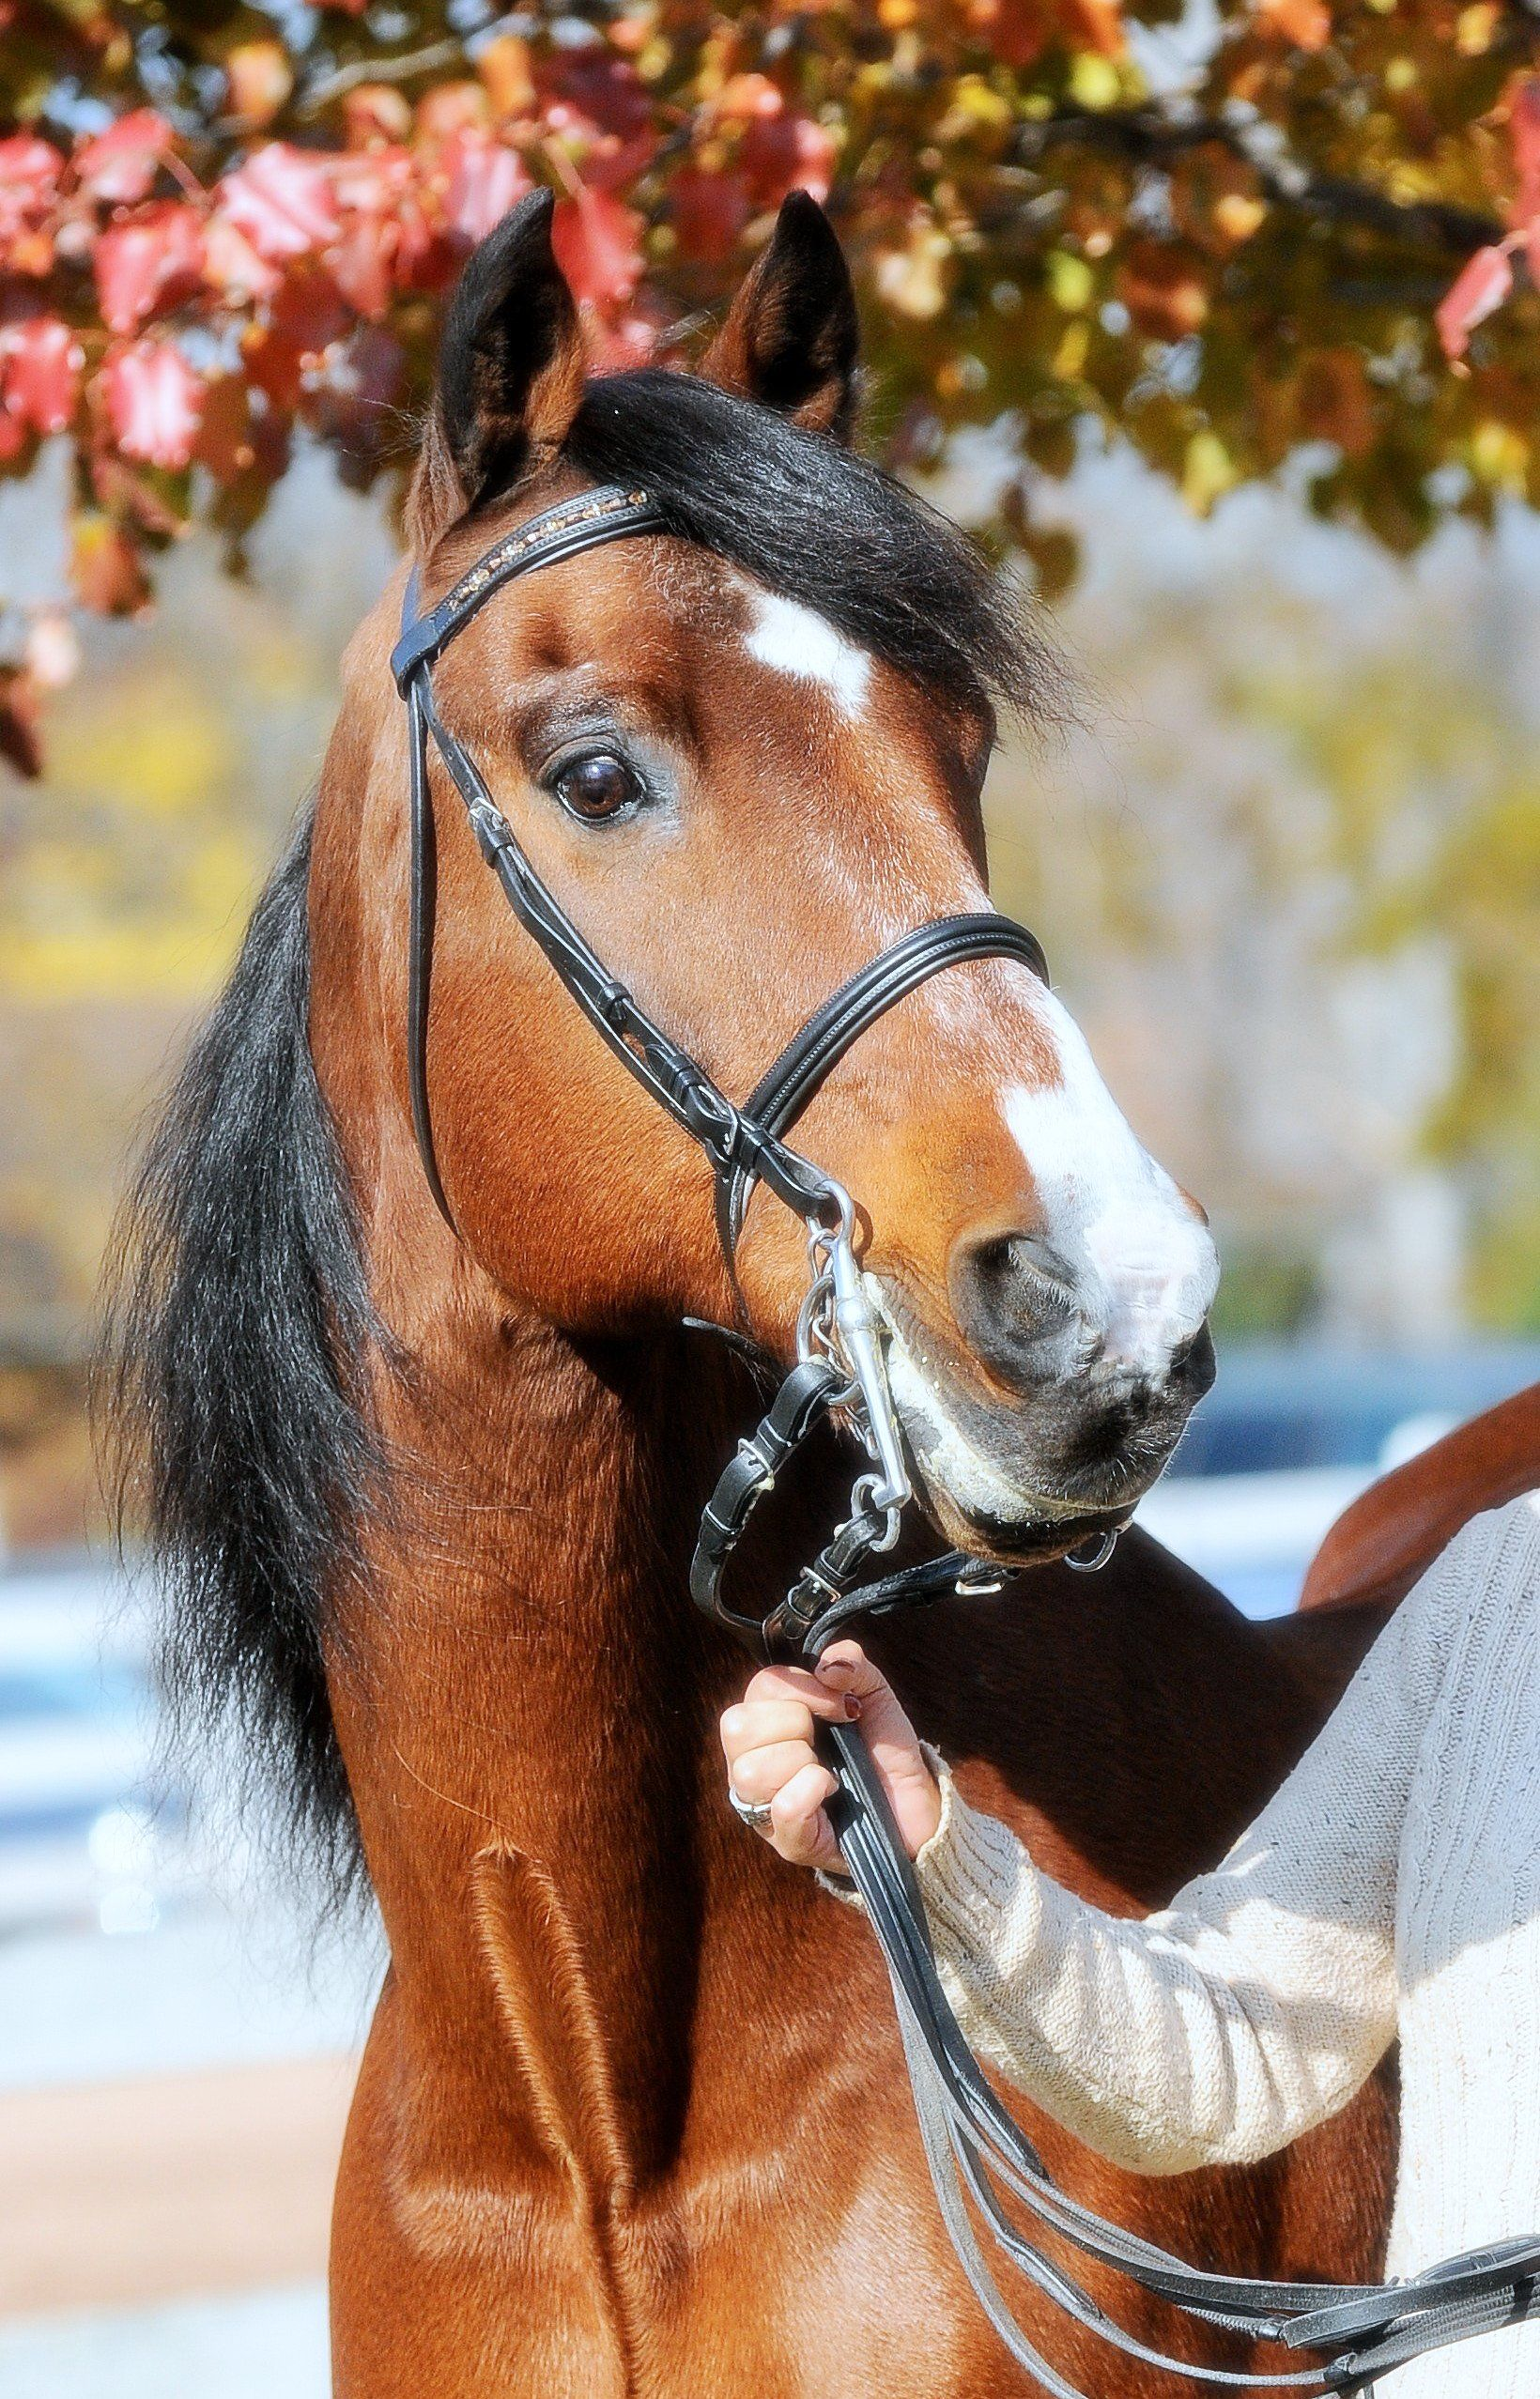 My Beautiful Morgan Gelding Equinox Legacy Aka Gus He Was My Riding